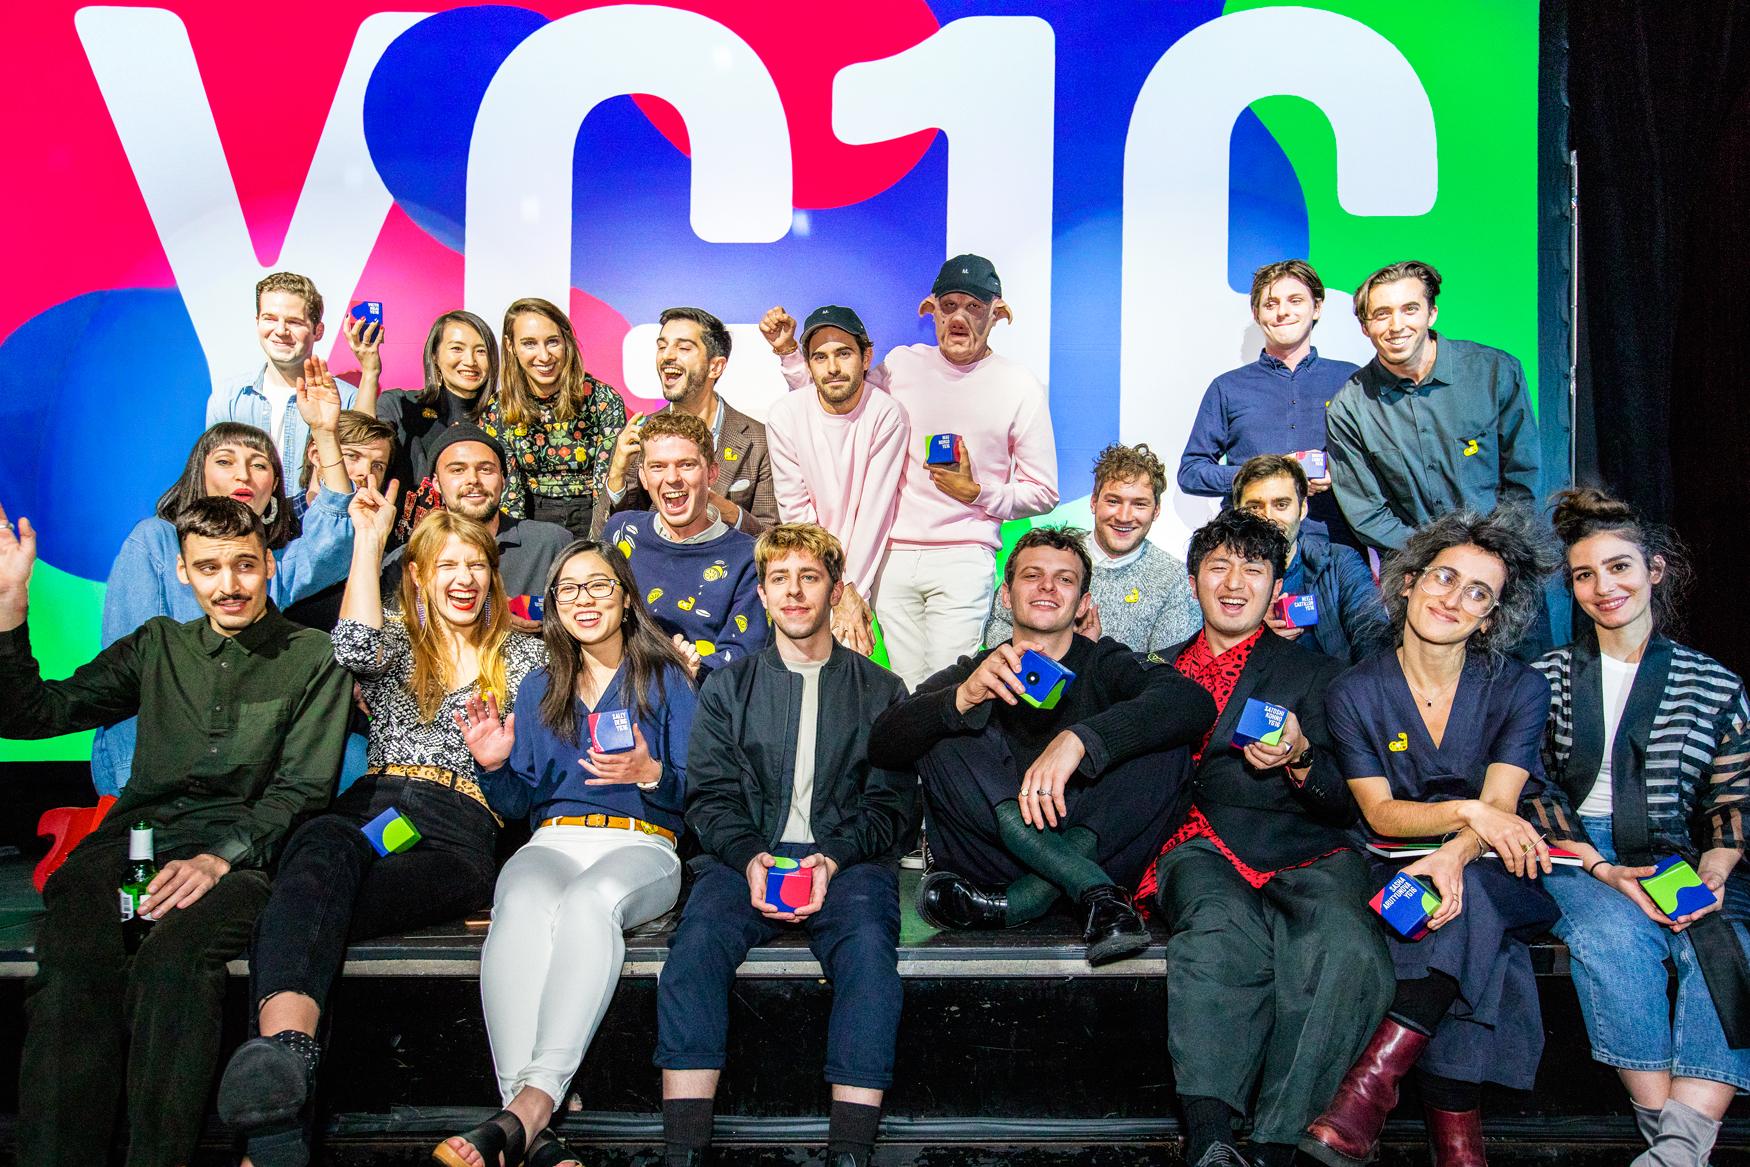 Yg16 show winners